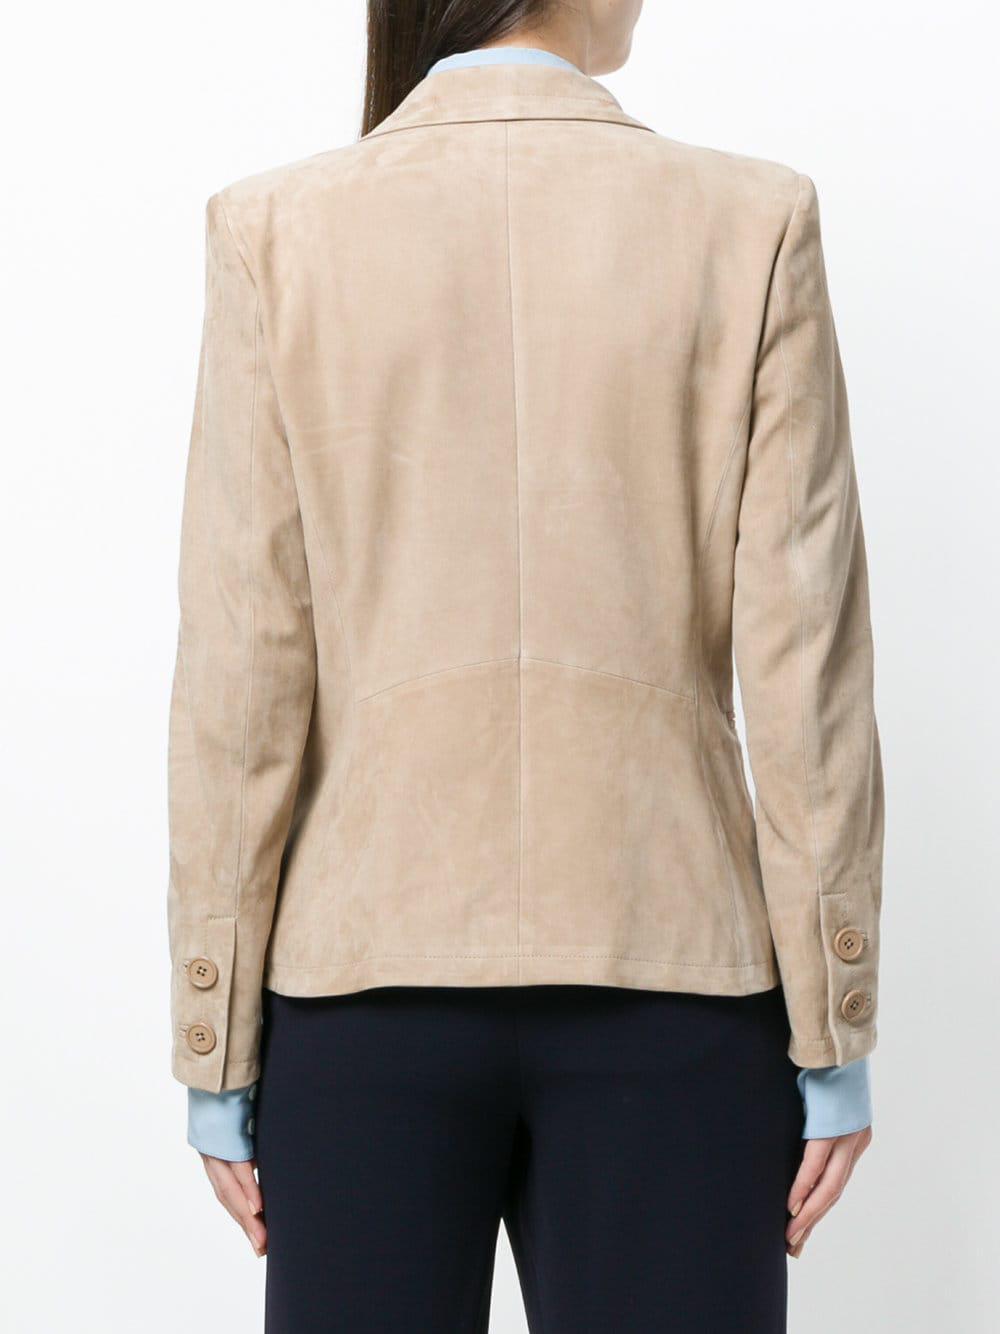 online store dfd13 4a71c sylvie-schimmel-Neutrals-Gondole-Jacket.jpeg